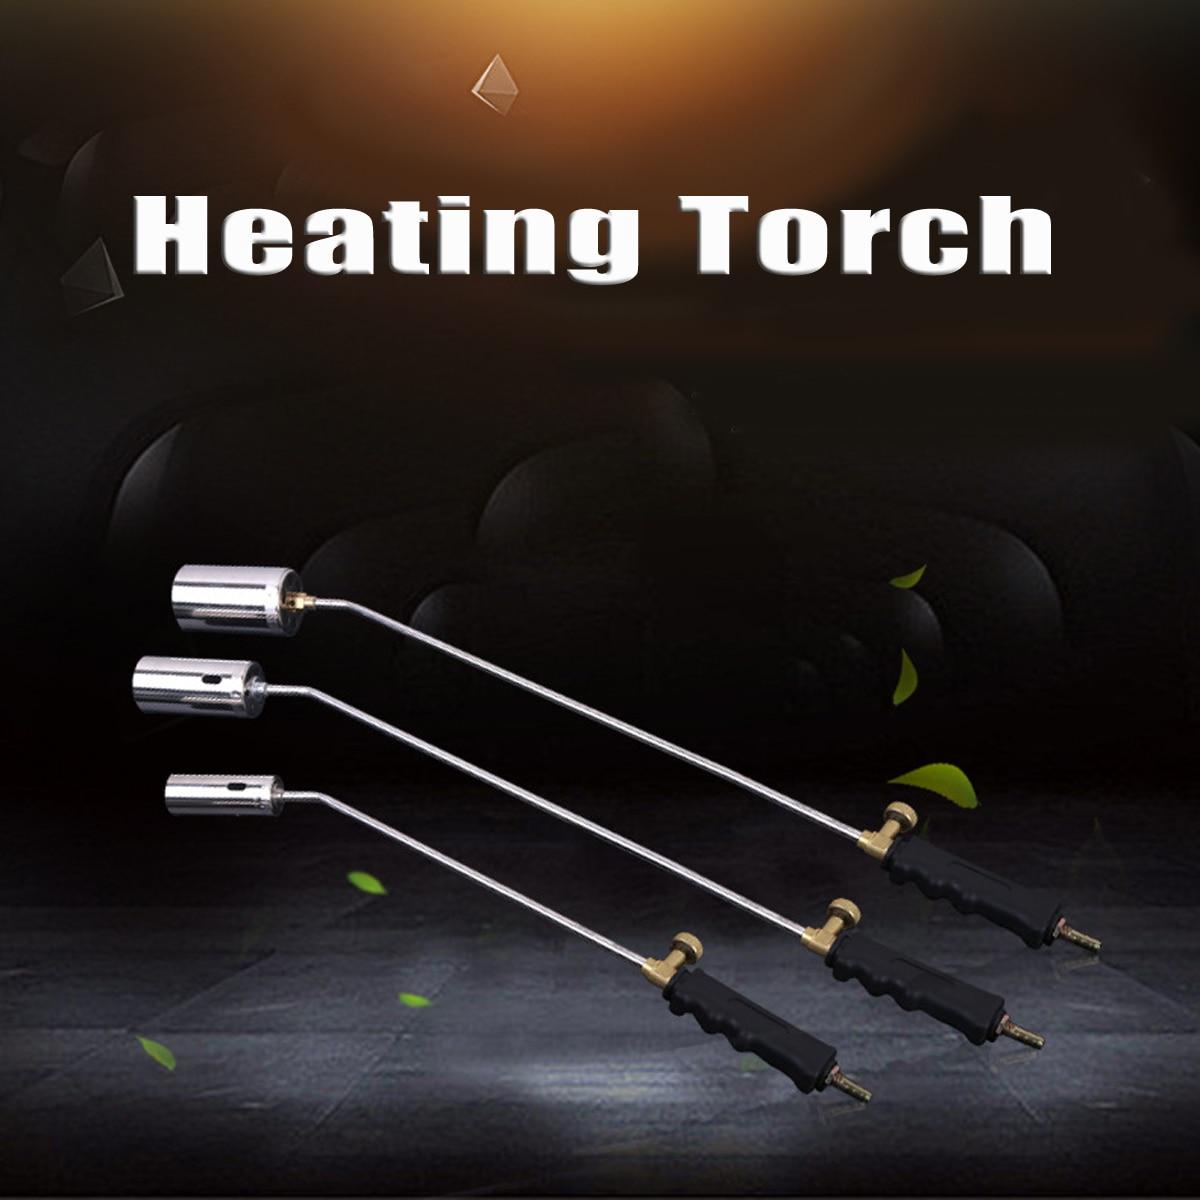 15 65 Heating Torch Propane Butane Gas Flame Blow Plunber